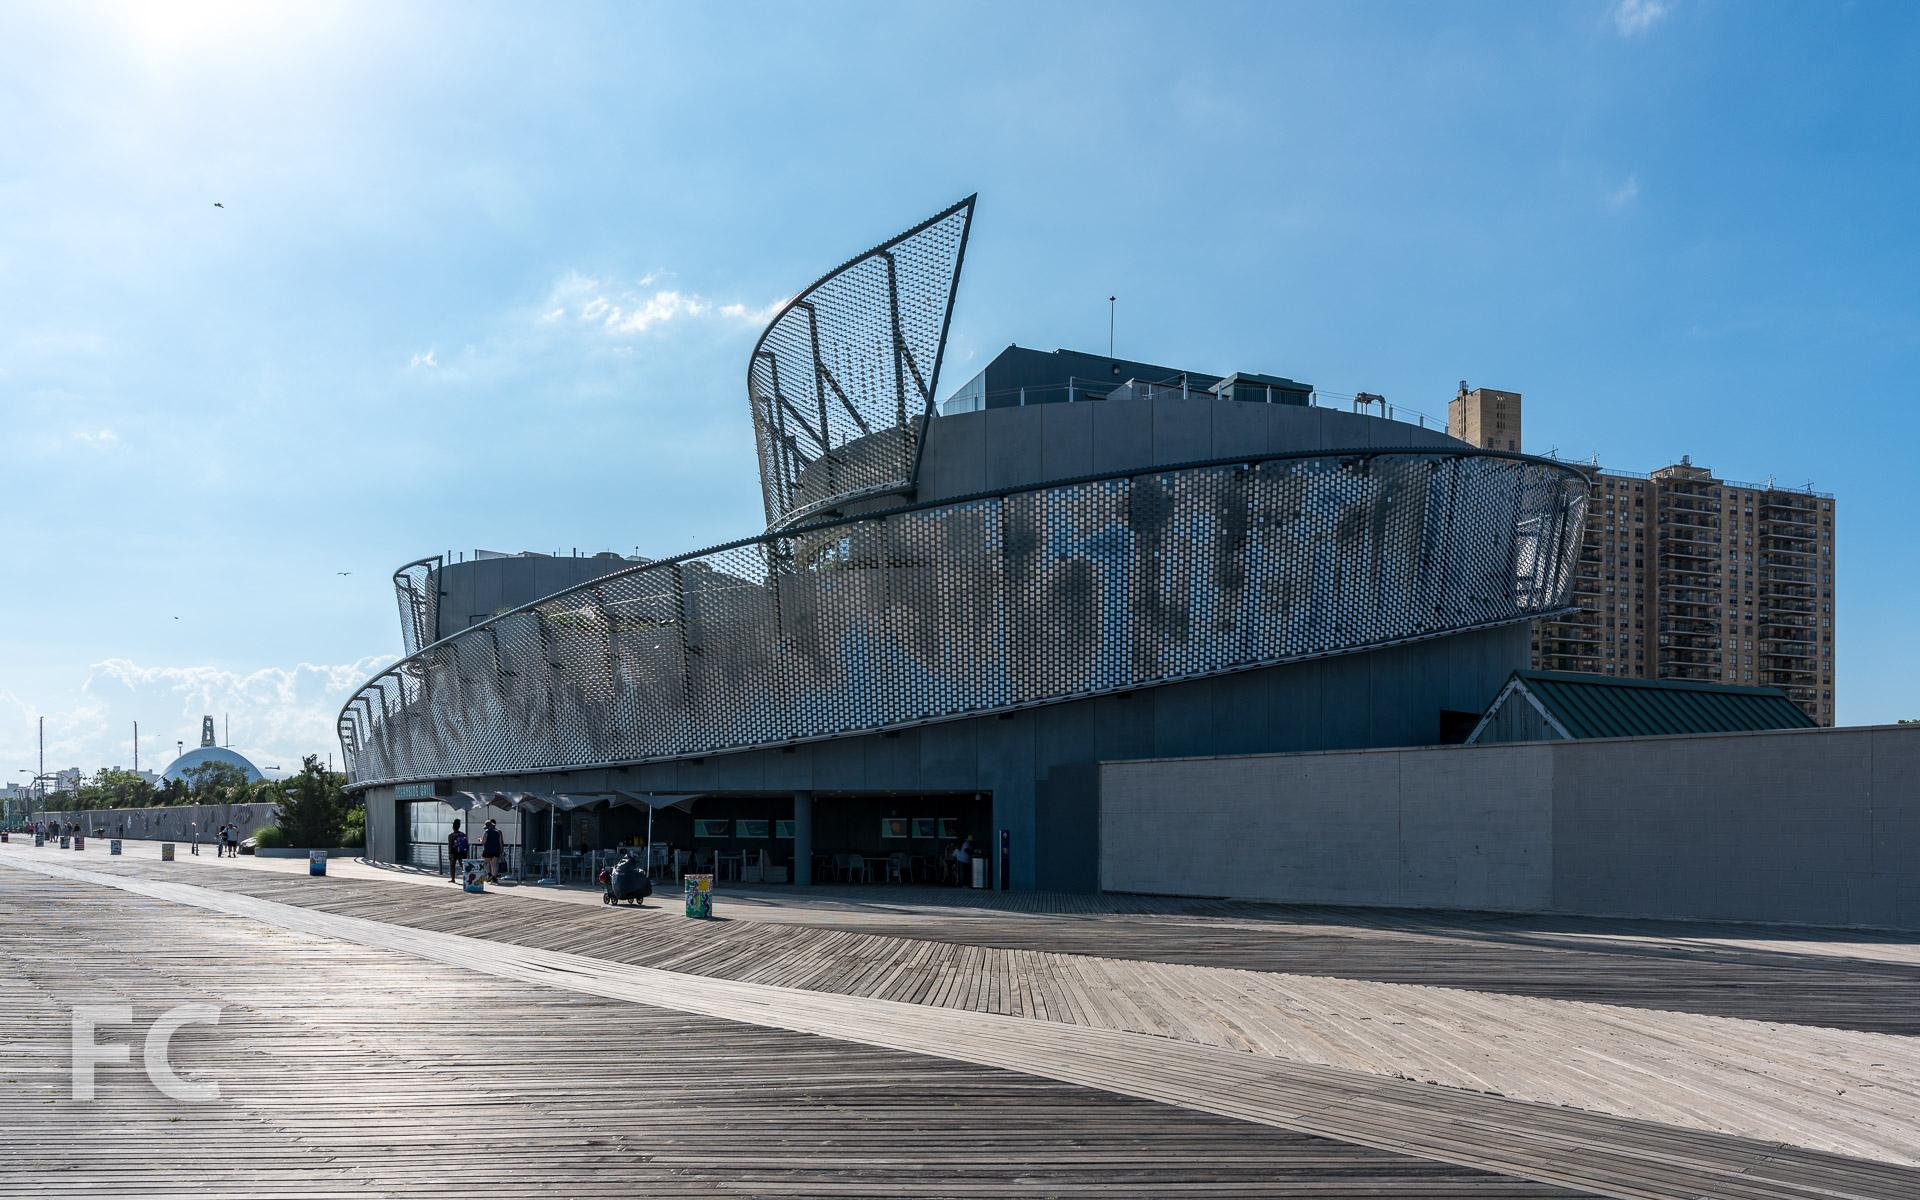 2018_07_05-NY Aquarium-DSC03639.jpg